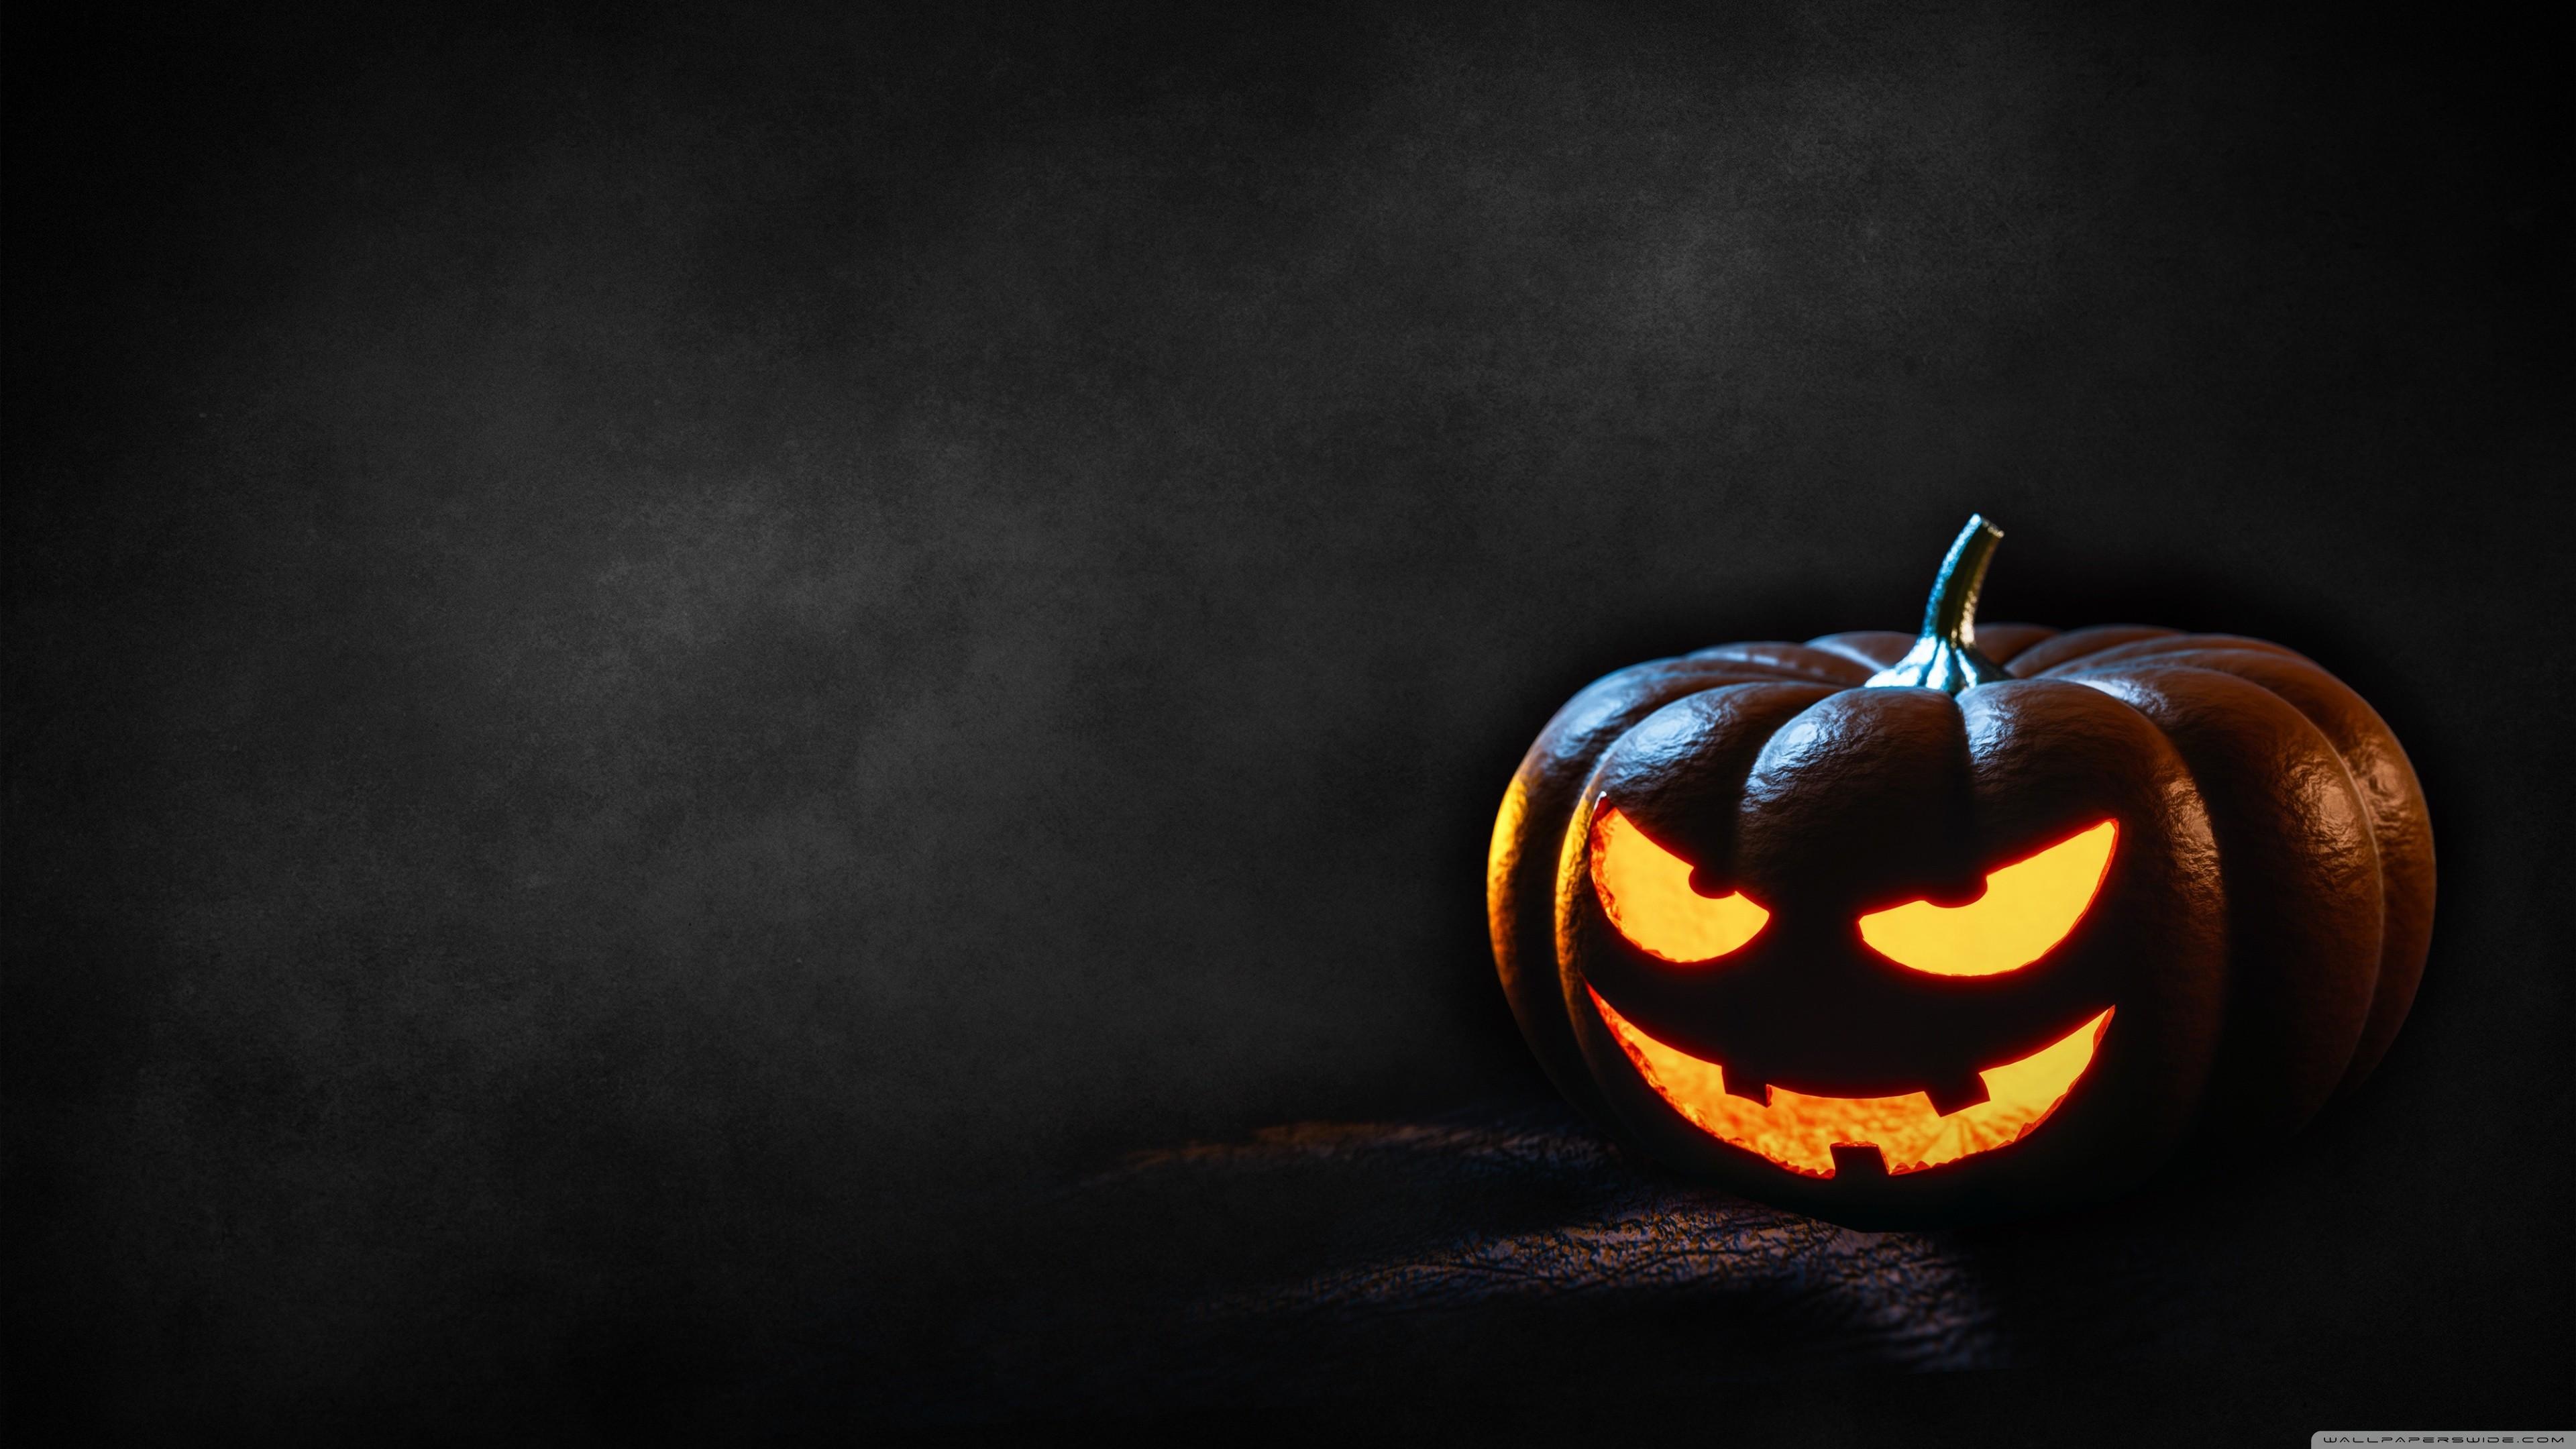 Halloween Wallpaper Background 70 images 3840x2160